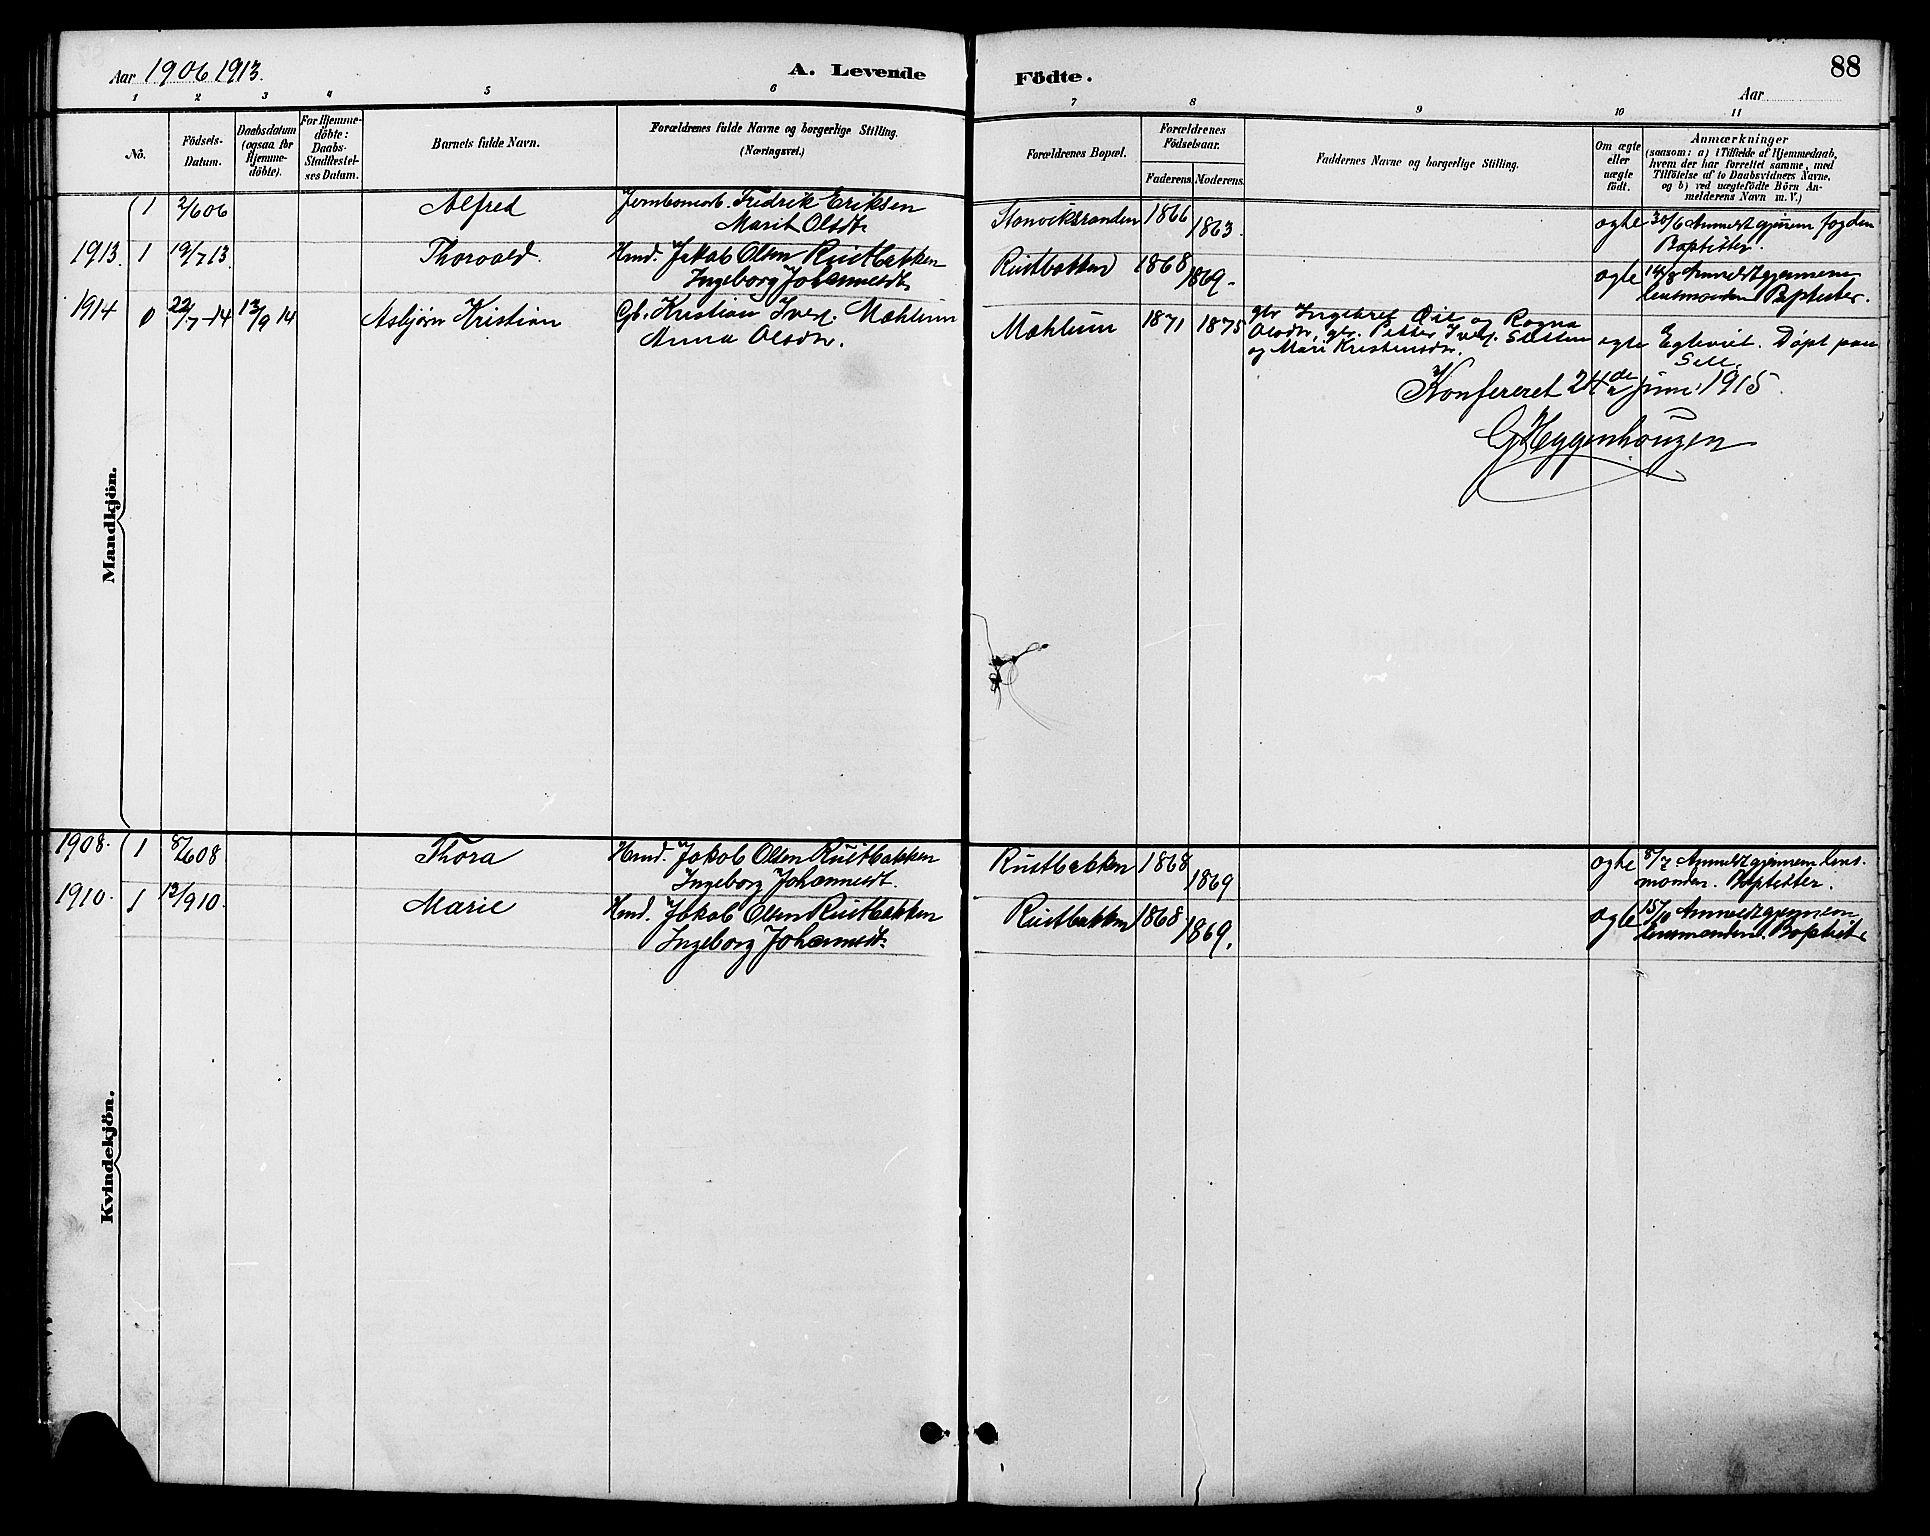 SAH, Nord-Fron prestekontor, Klokkerbok nr. 6, 1887-1914, s. 88